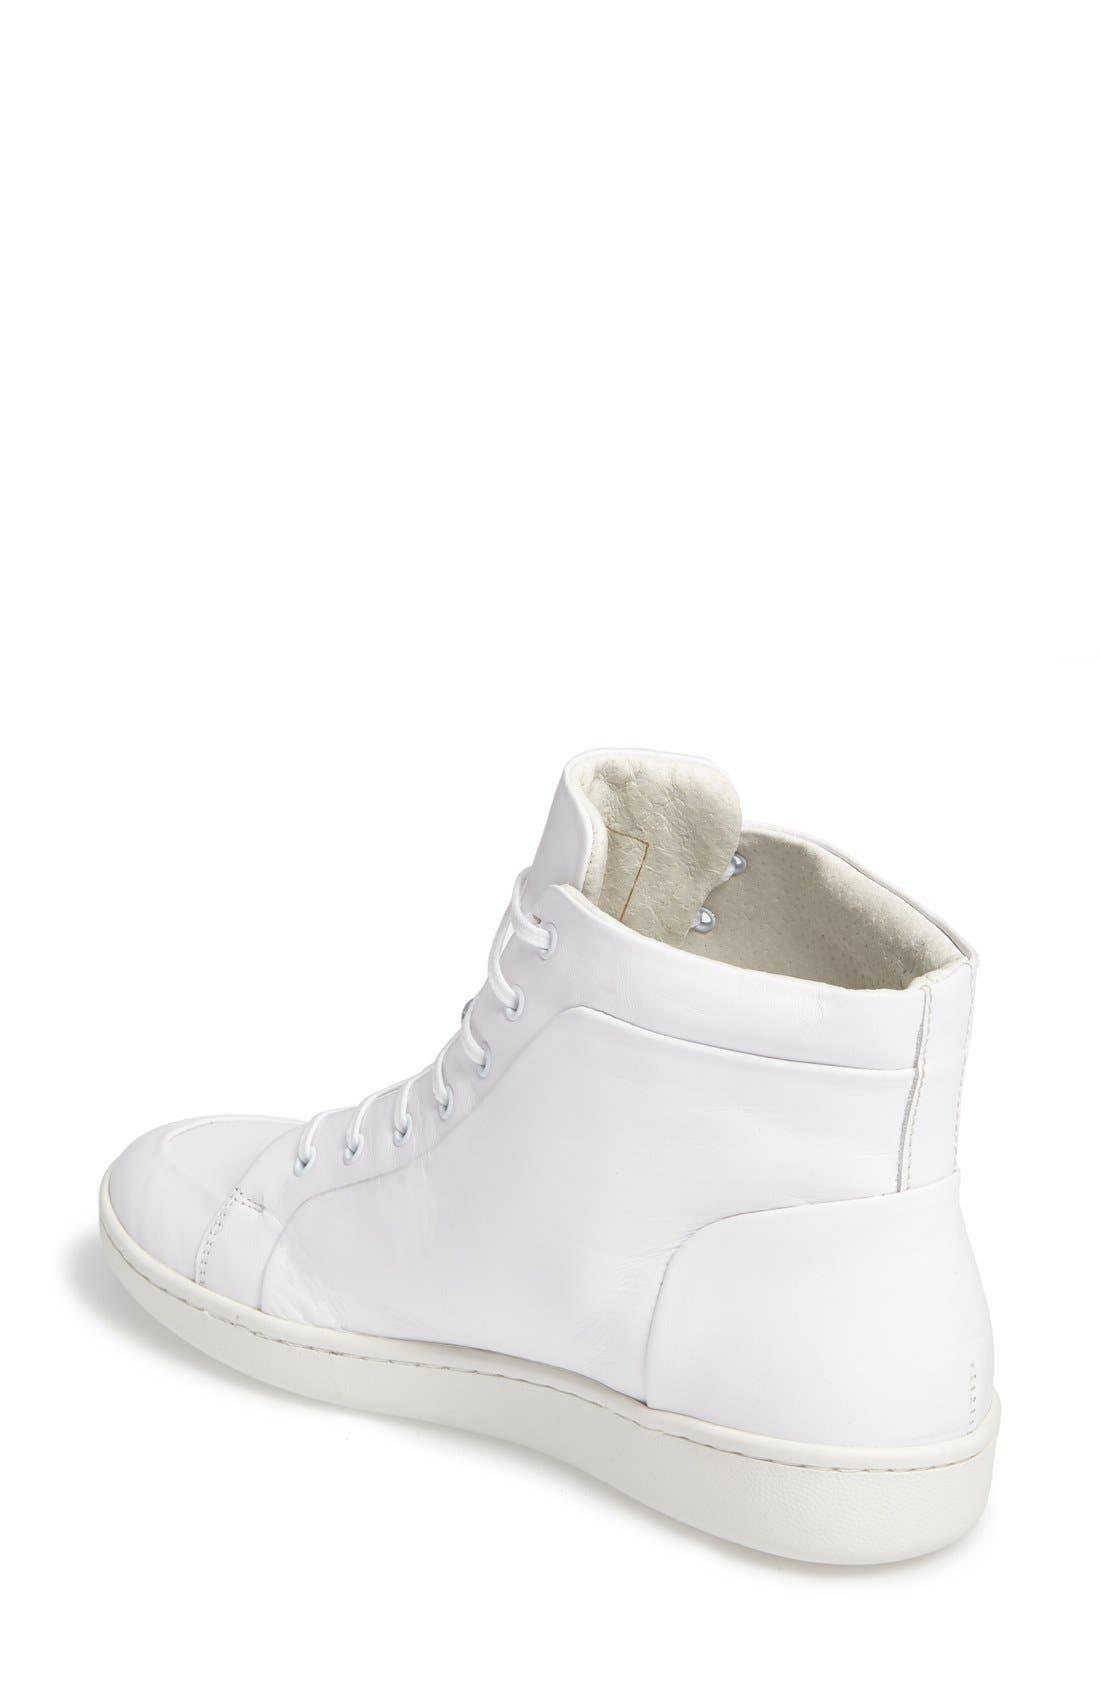 Molly High Top Sneaker,                             Alternate thumbnail 4, color,